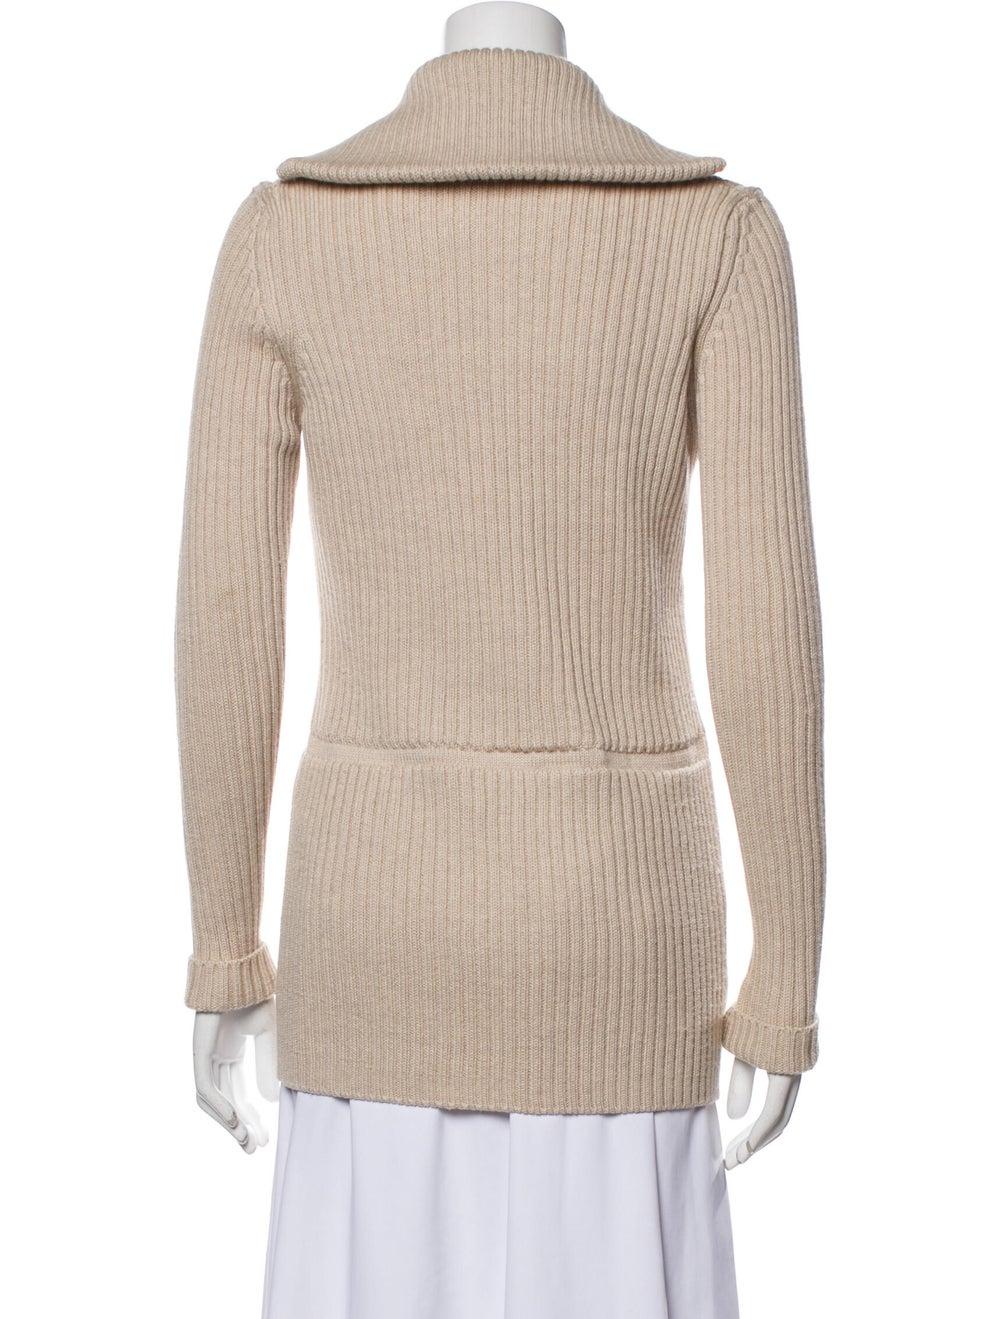 Prada Wool Sweater Wool - image 3